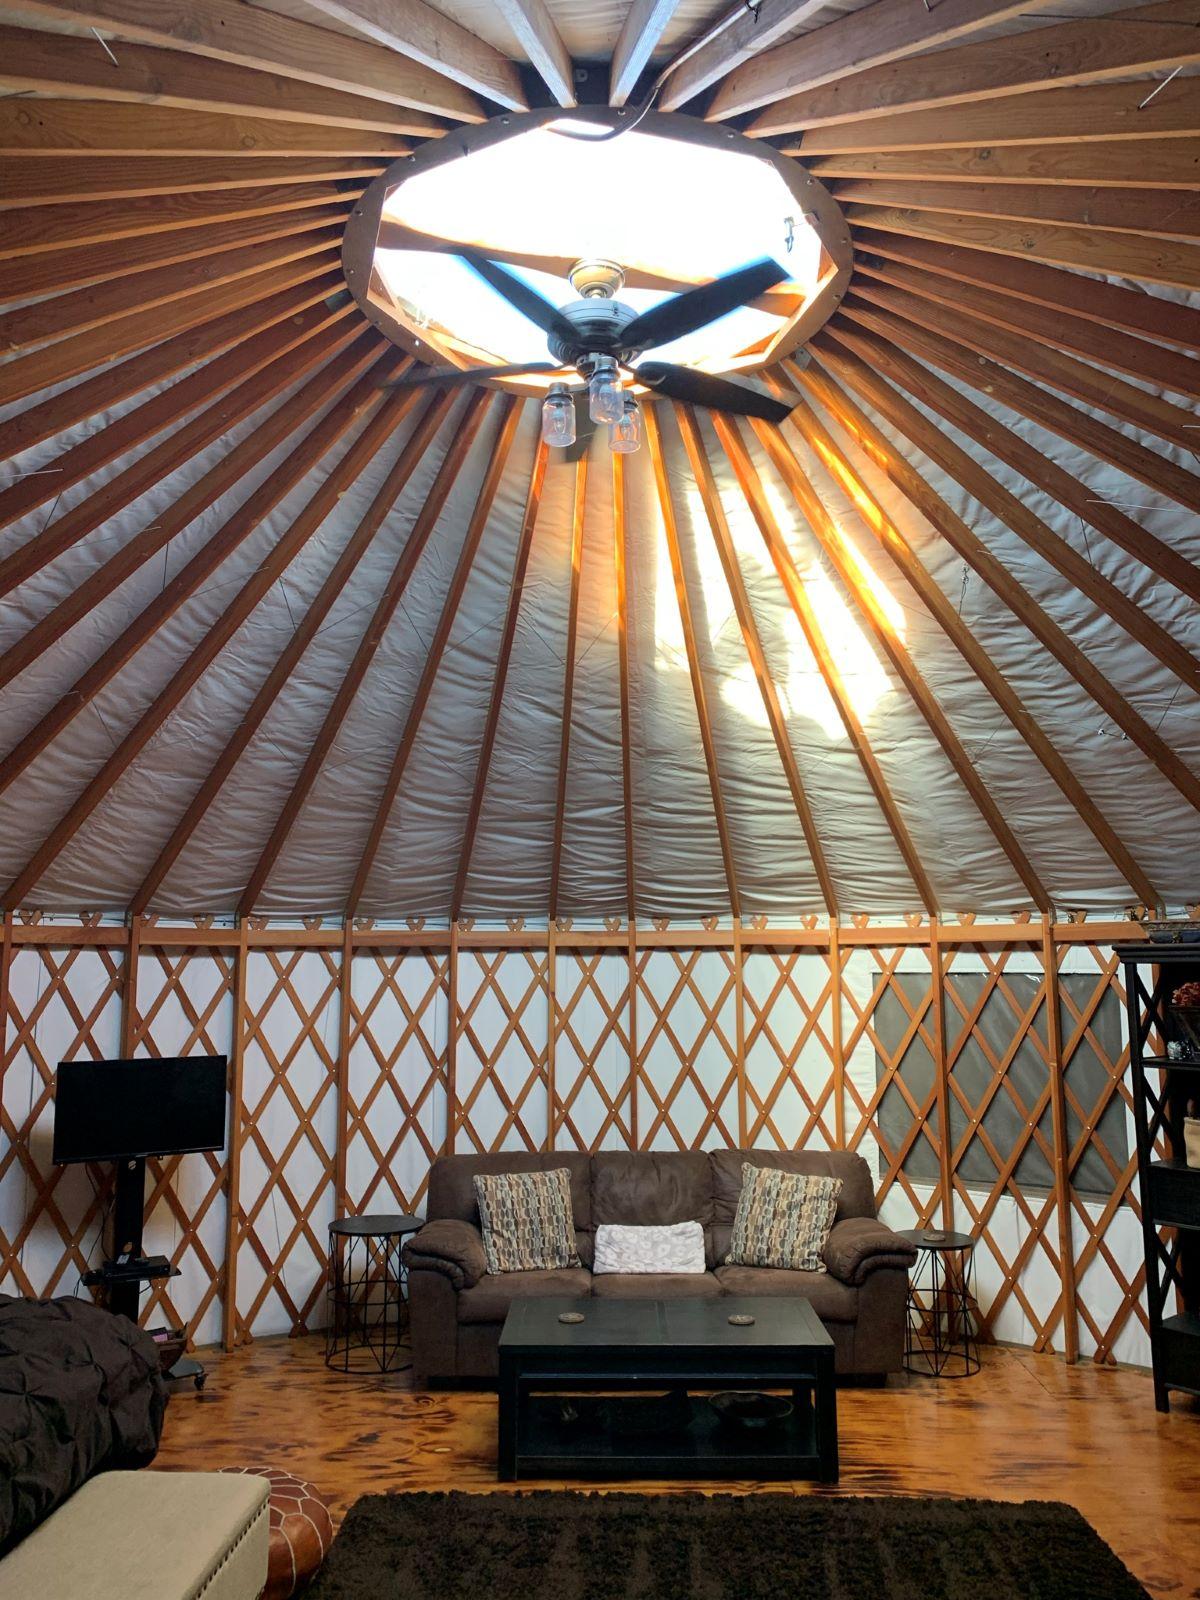 Indoor Glamping Yurt at Paradise Cove